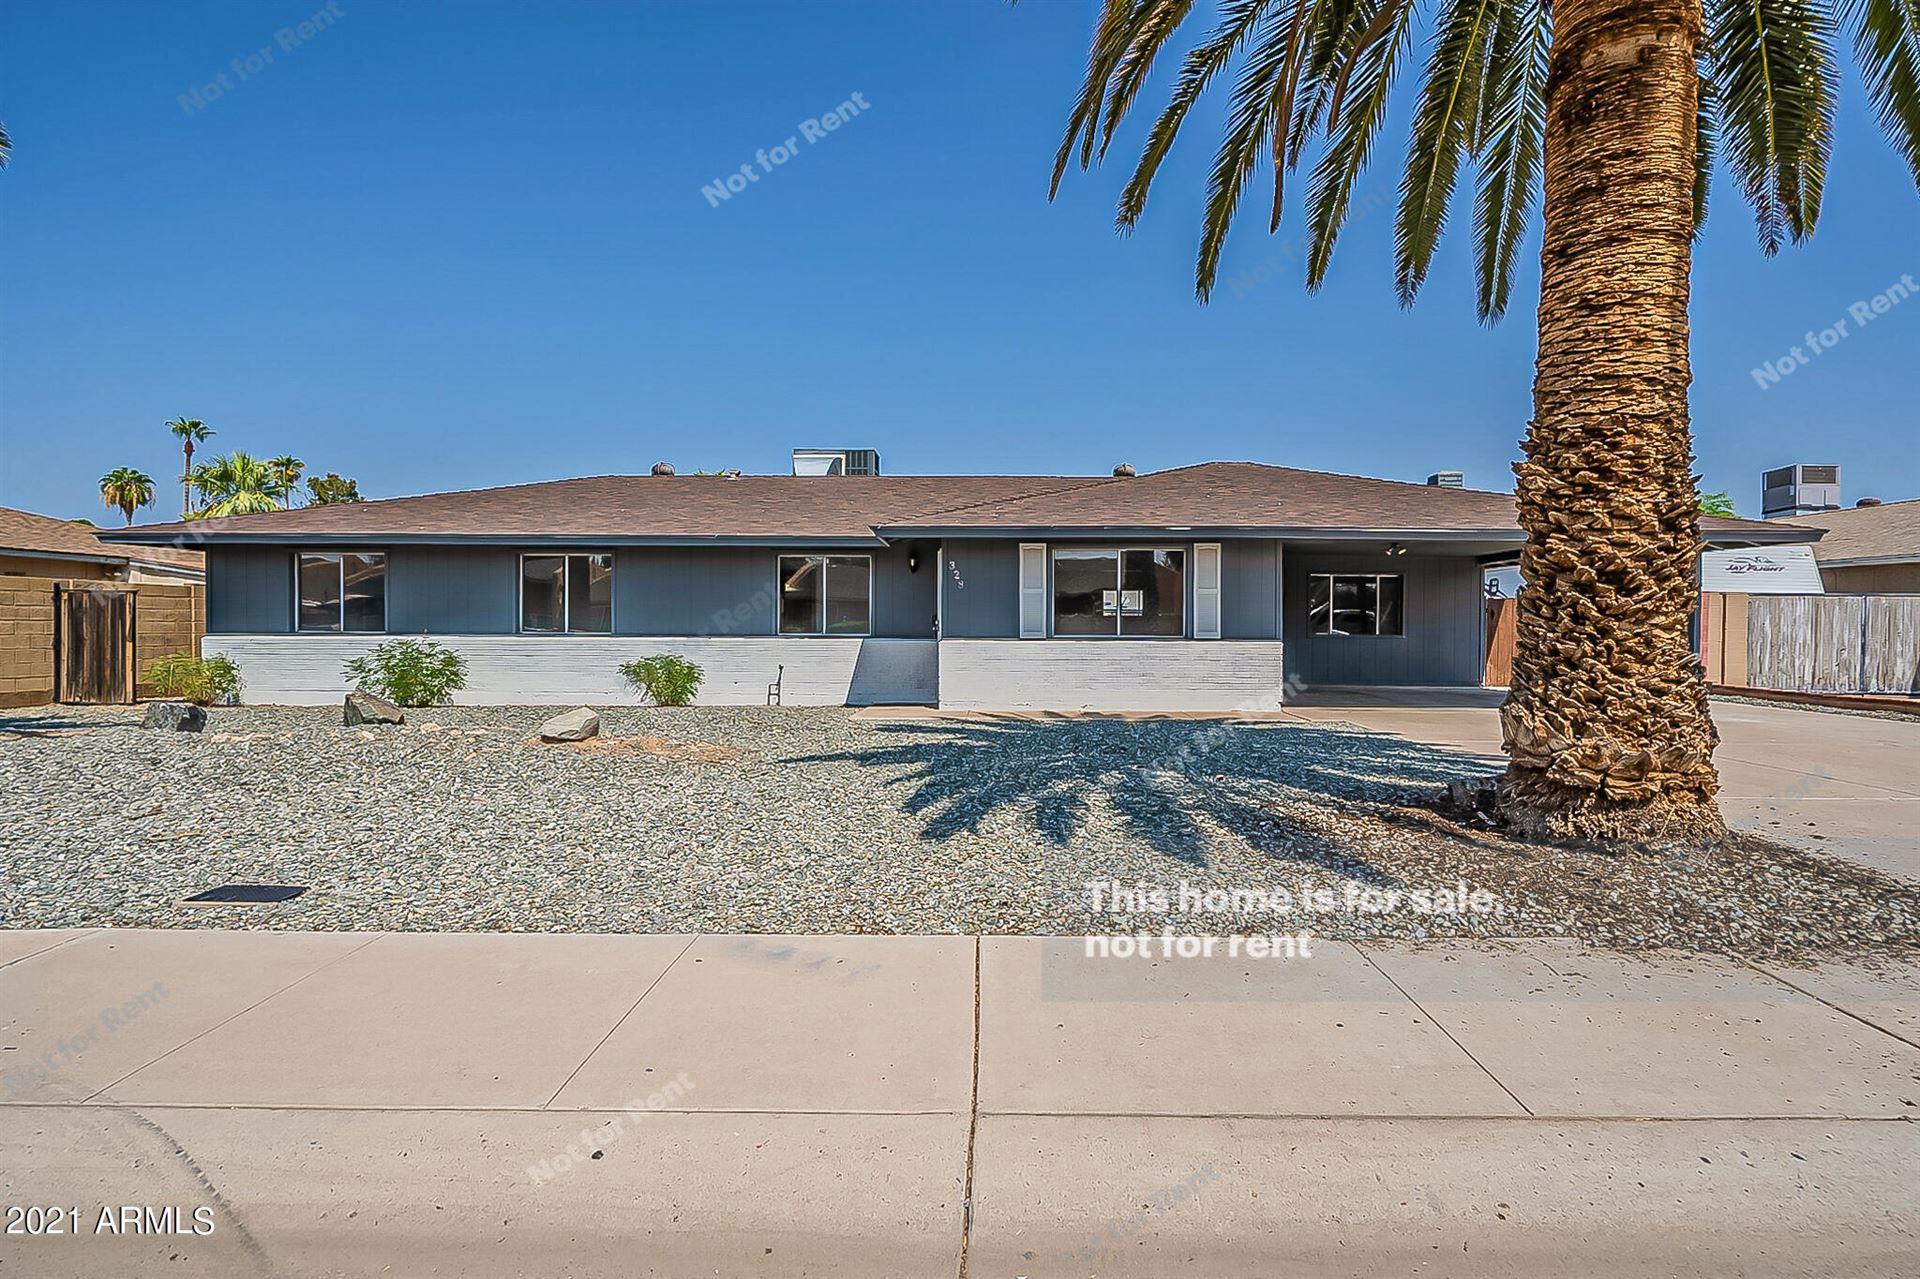 Photo of 328 E DUNBAR Drive, Tempe, AZ 85282 (MLS # 6295083)